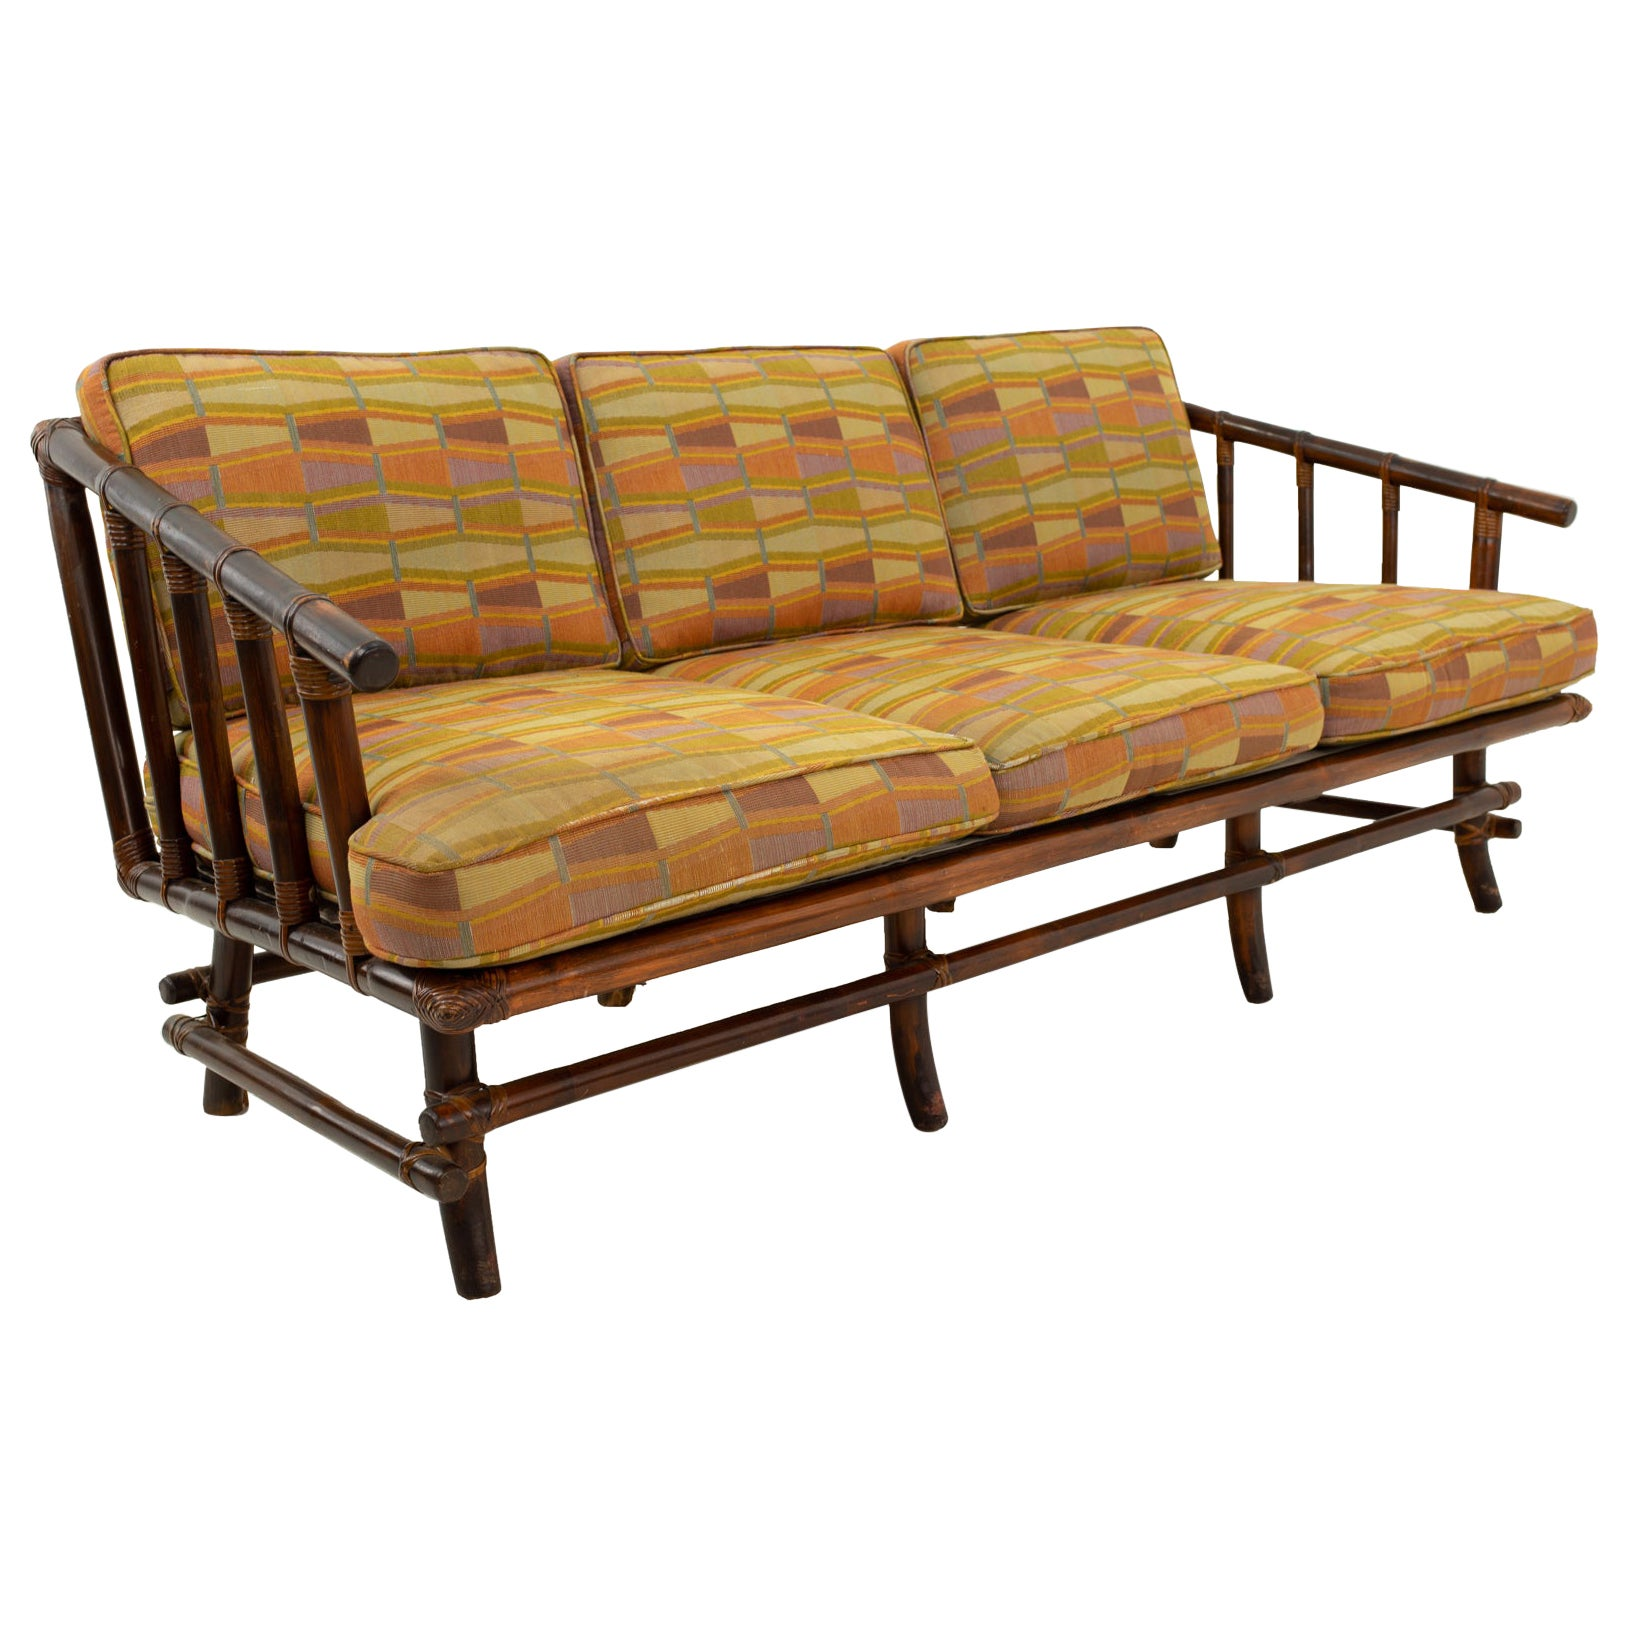 John Wisner for Ficks Reed Style Bamboo Mid Century 3-Seat Sofa